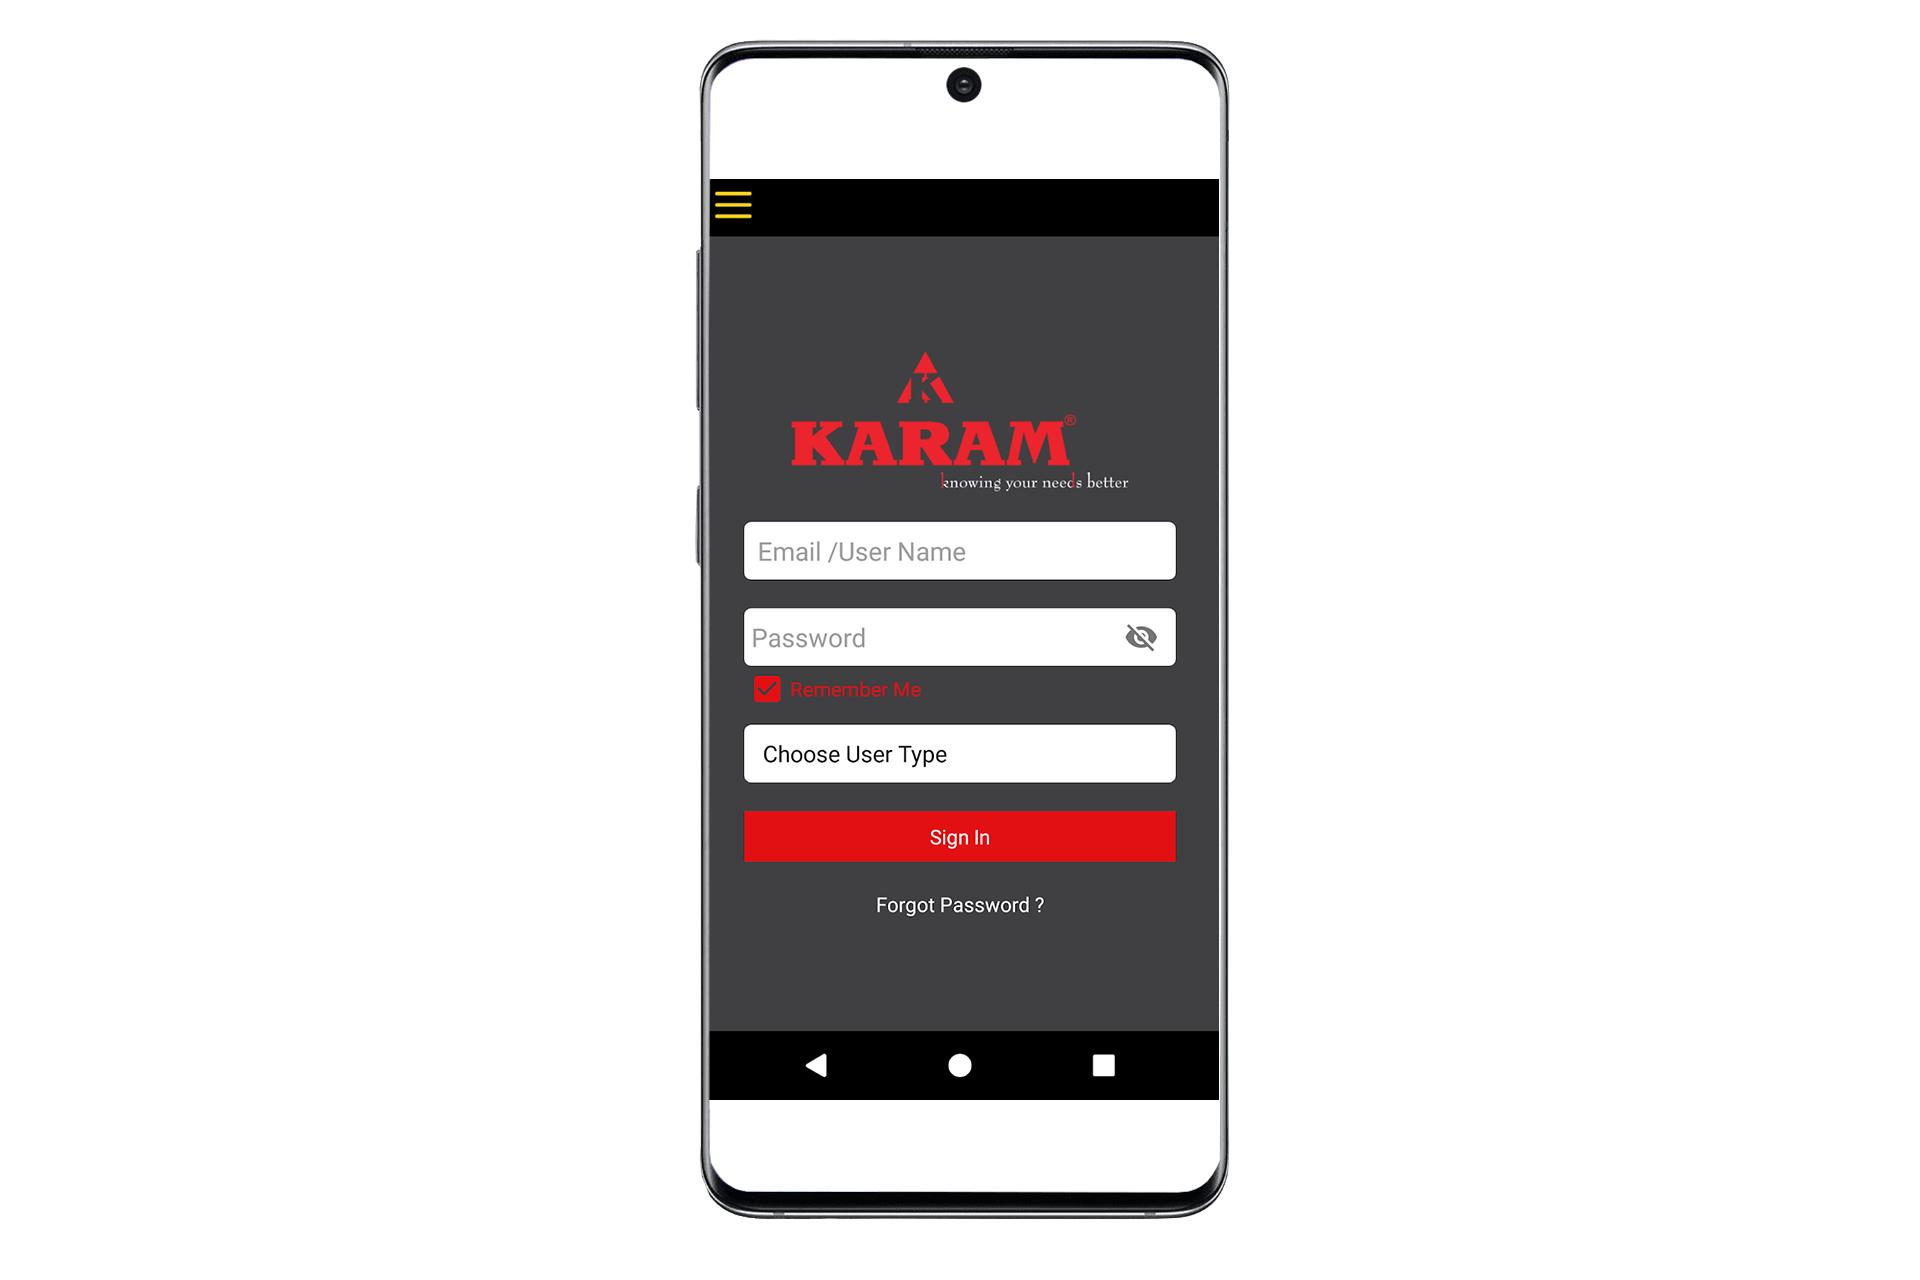 karam-training-android-03